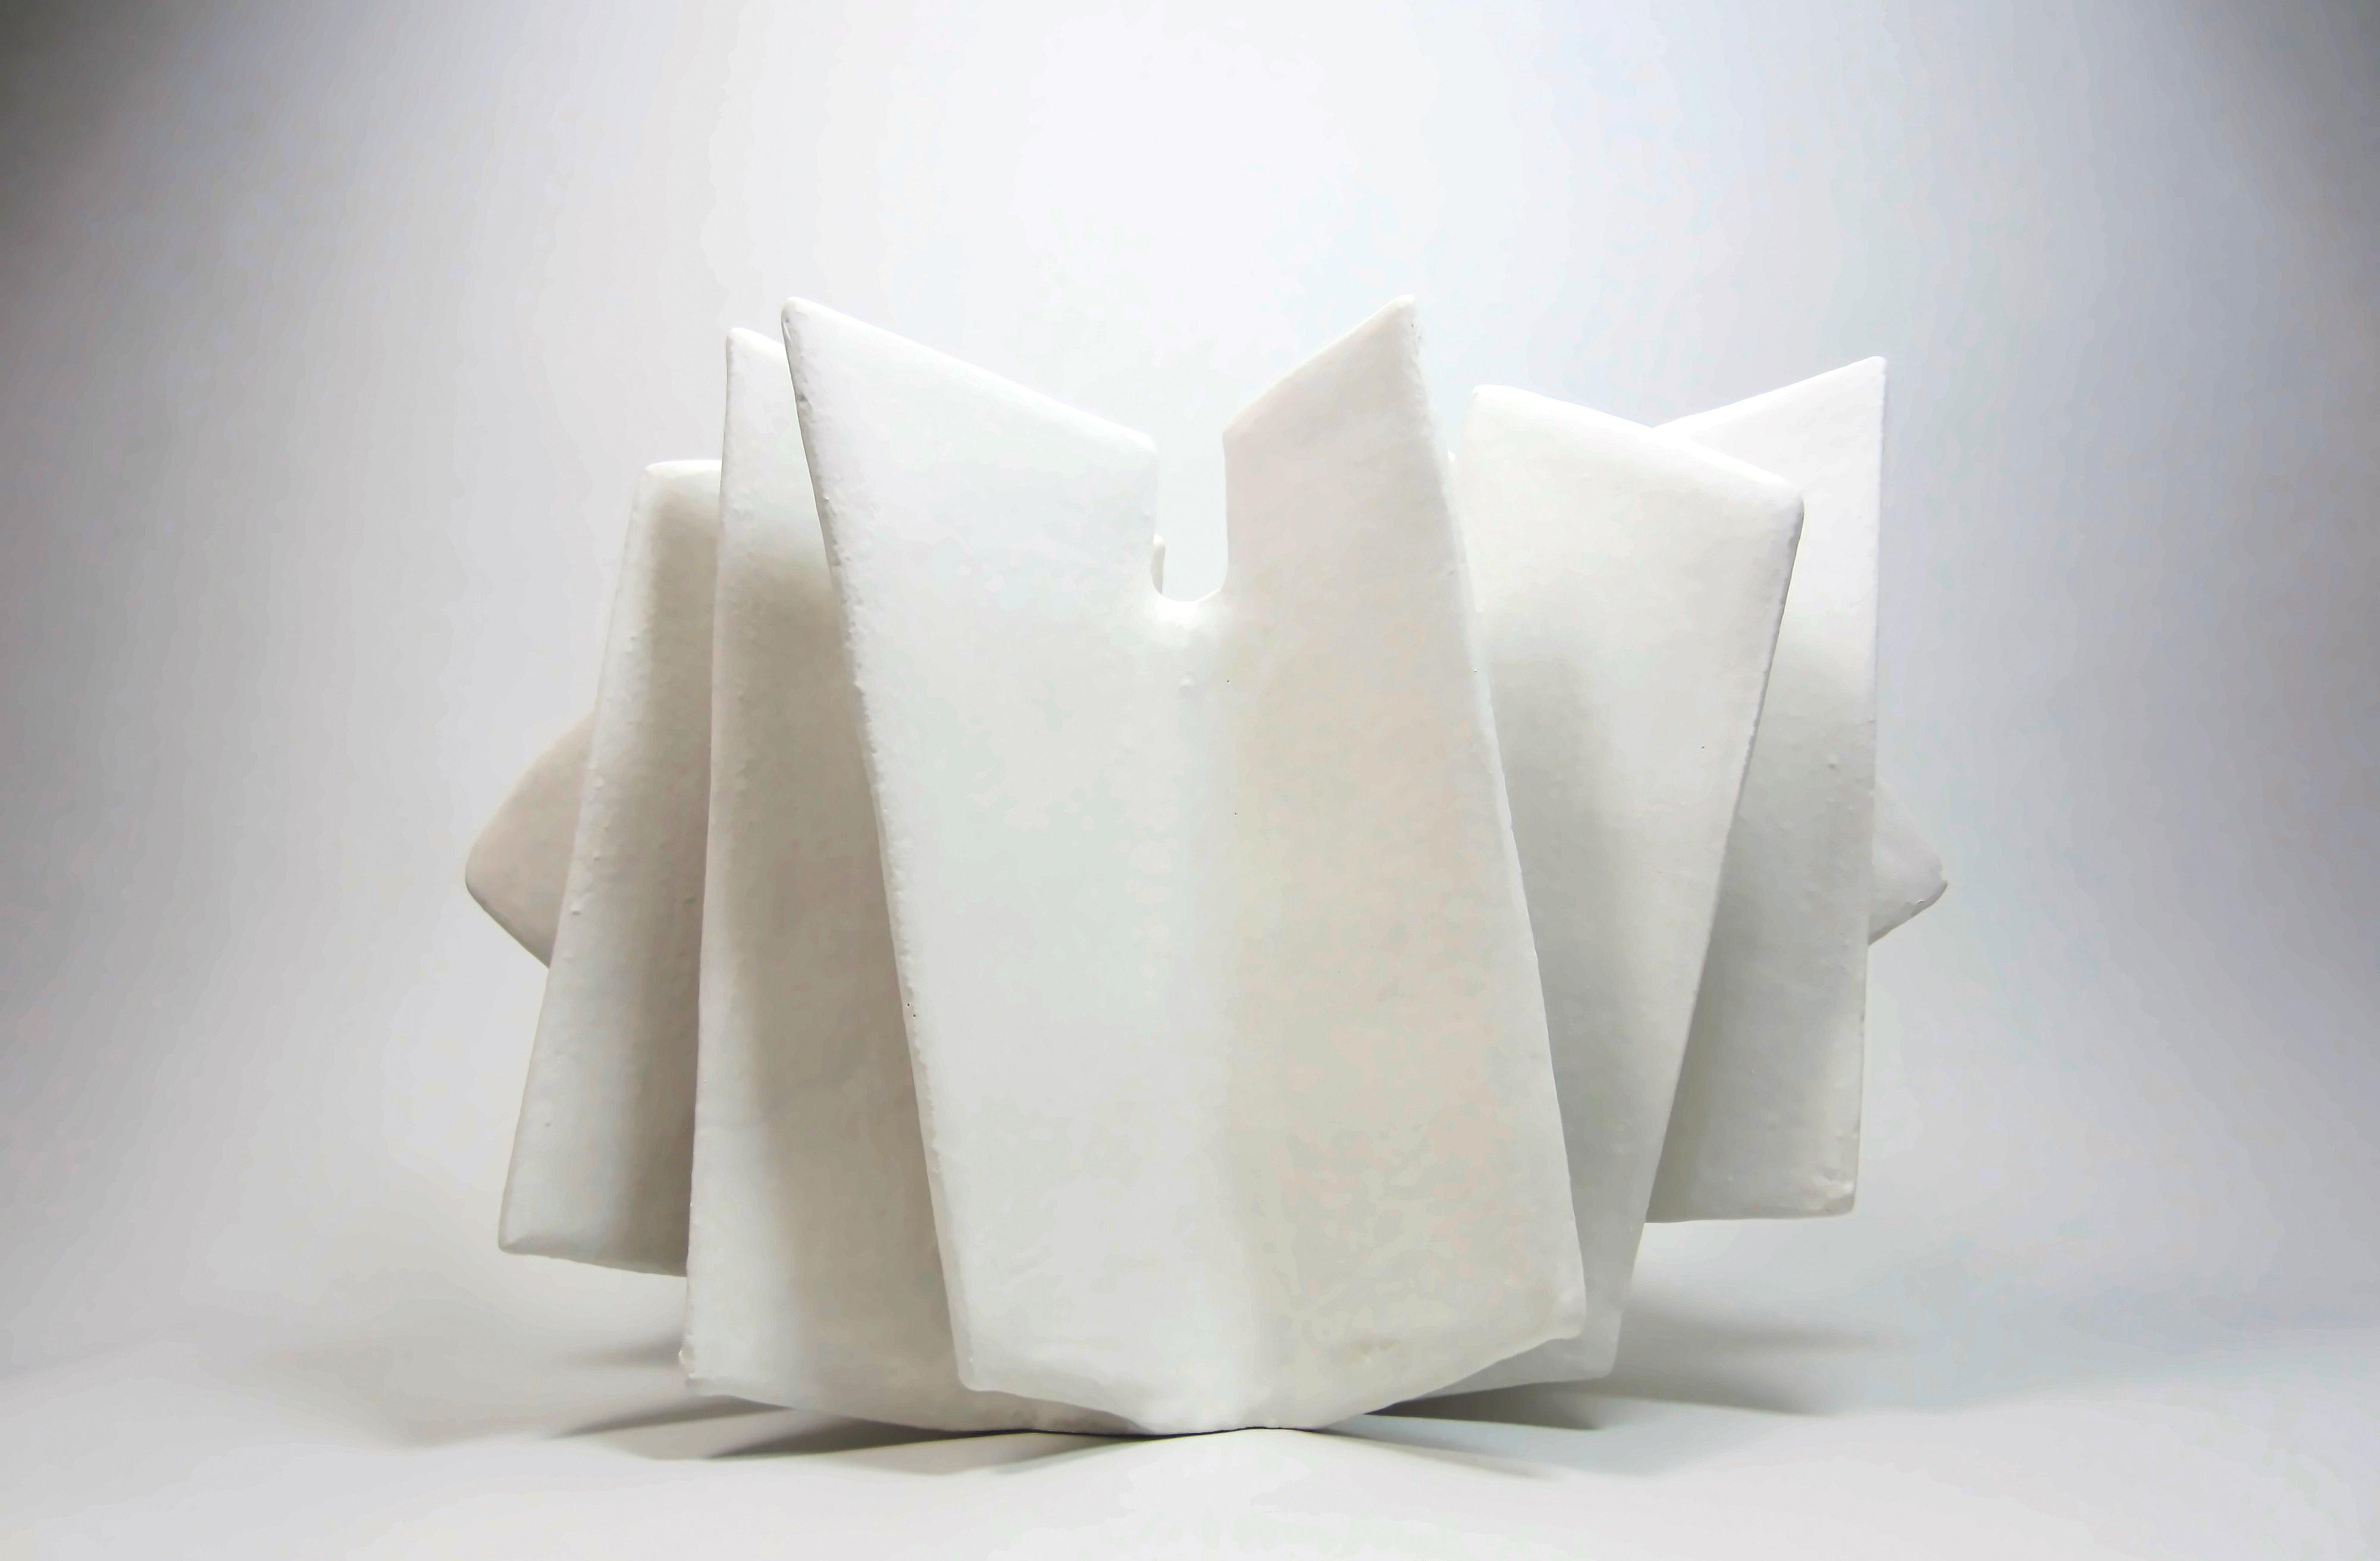 Sabine Martin, Vasen, Steinzeug, Keramik, Skulptur